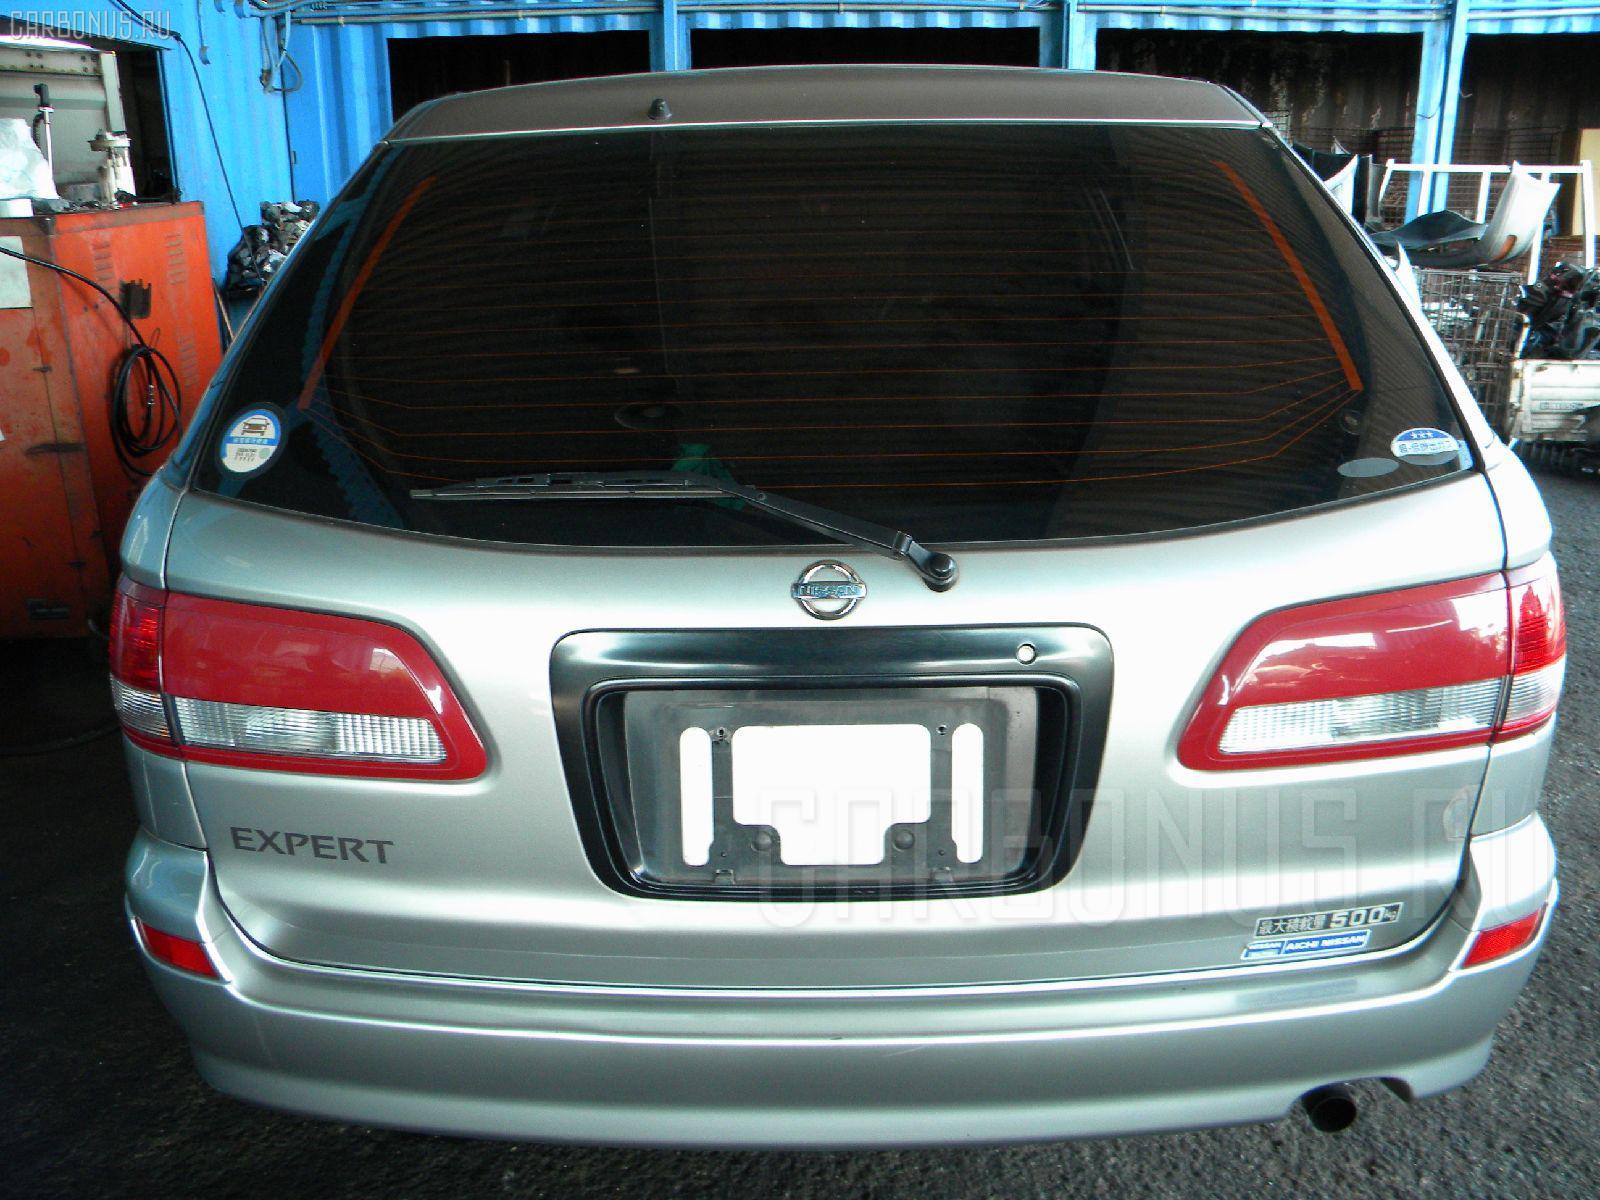 Тросик капота NISSAN EXPERT VW11 Фото 7